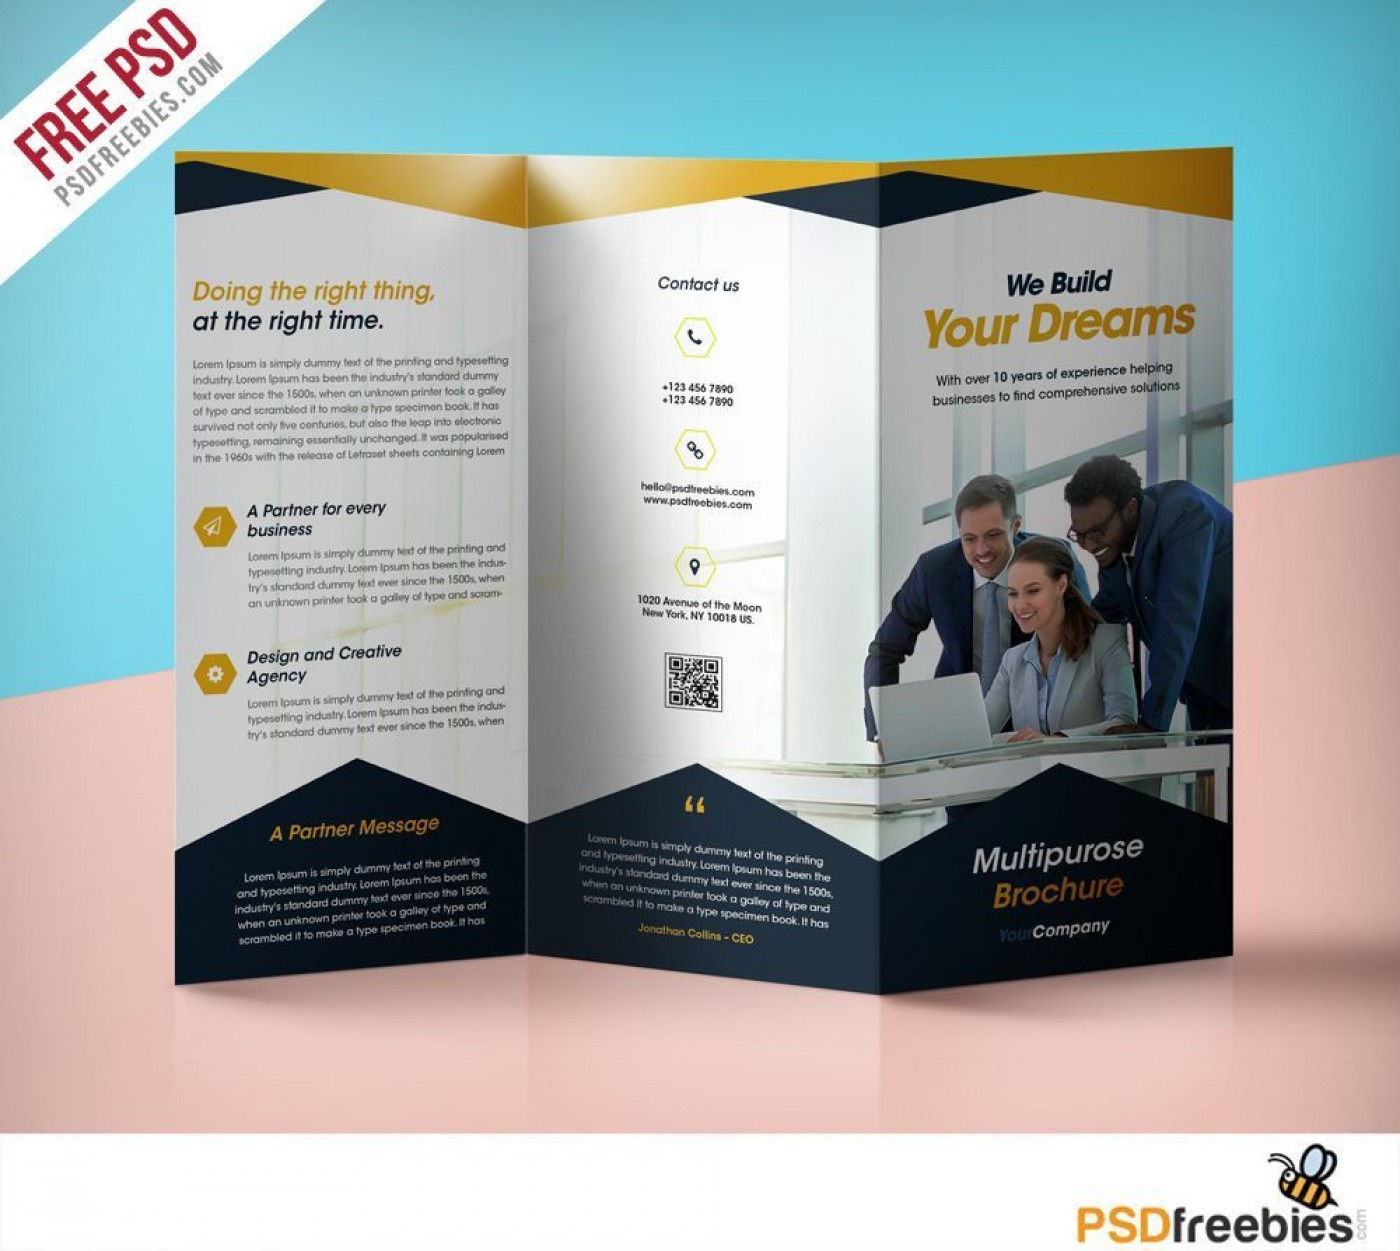 000 Simple Corporate Brochure Design Template Psd Free Download Photo  Hotel1400